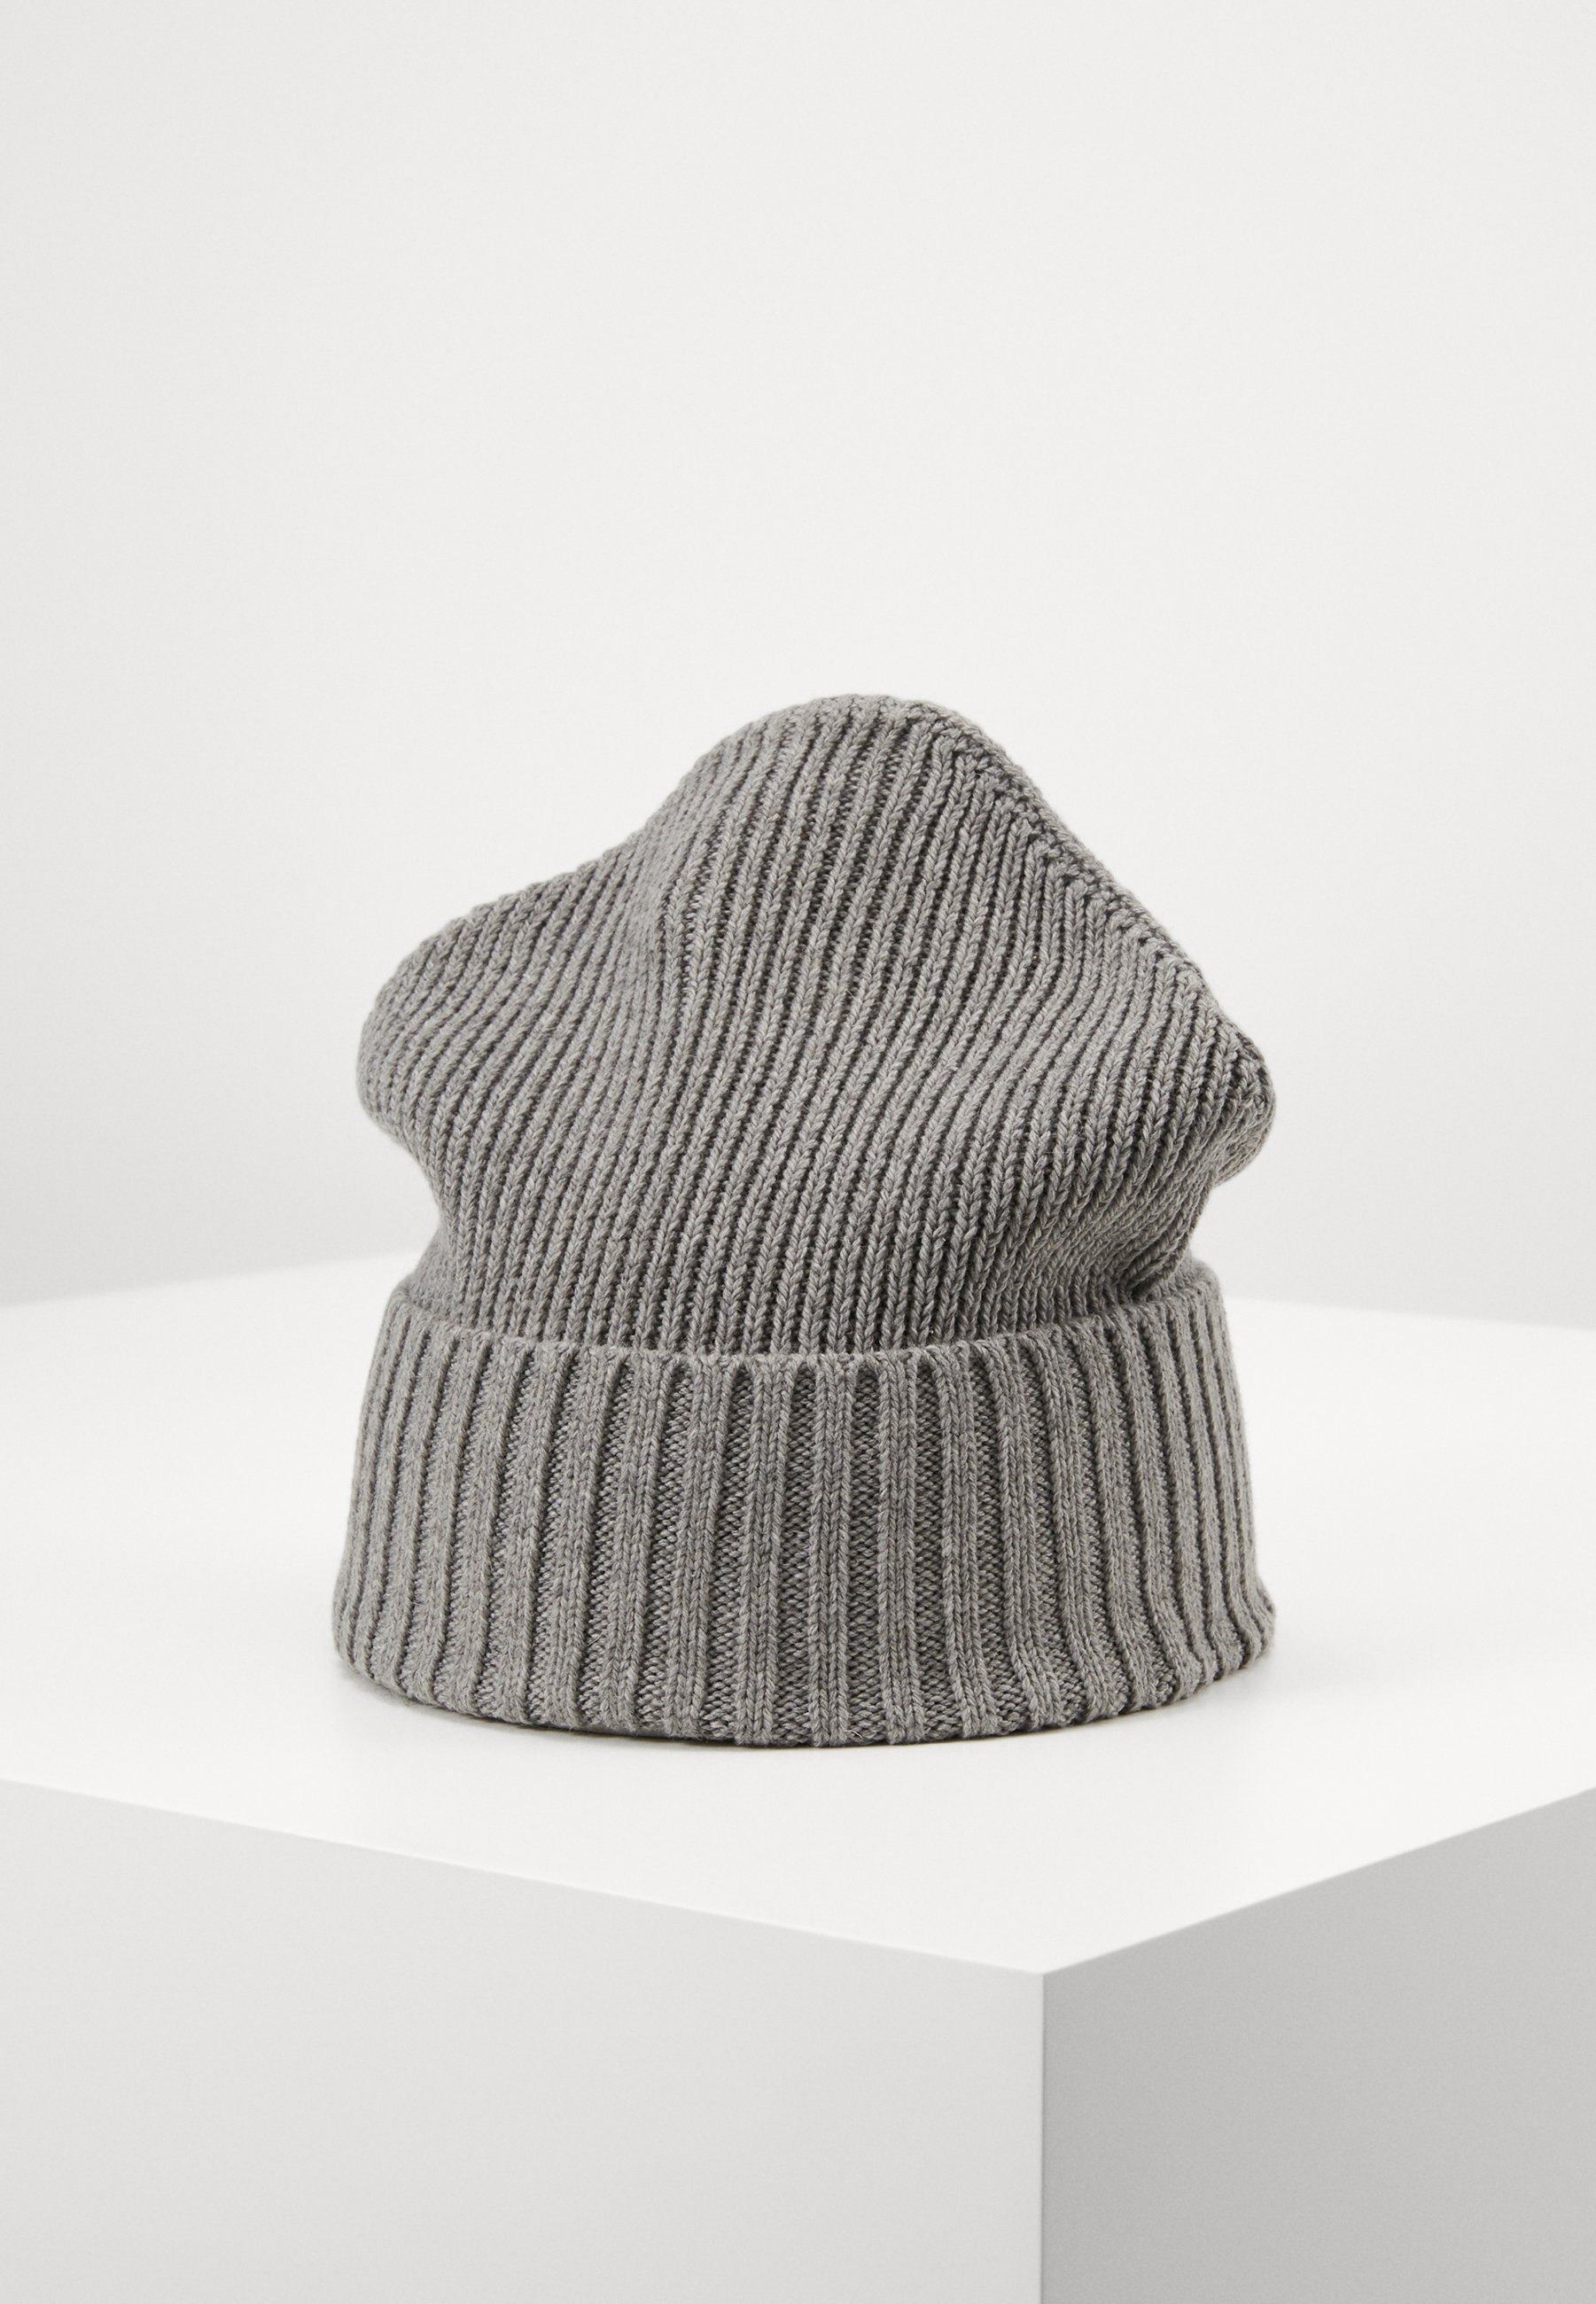 Bonnet grey